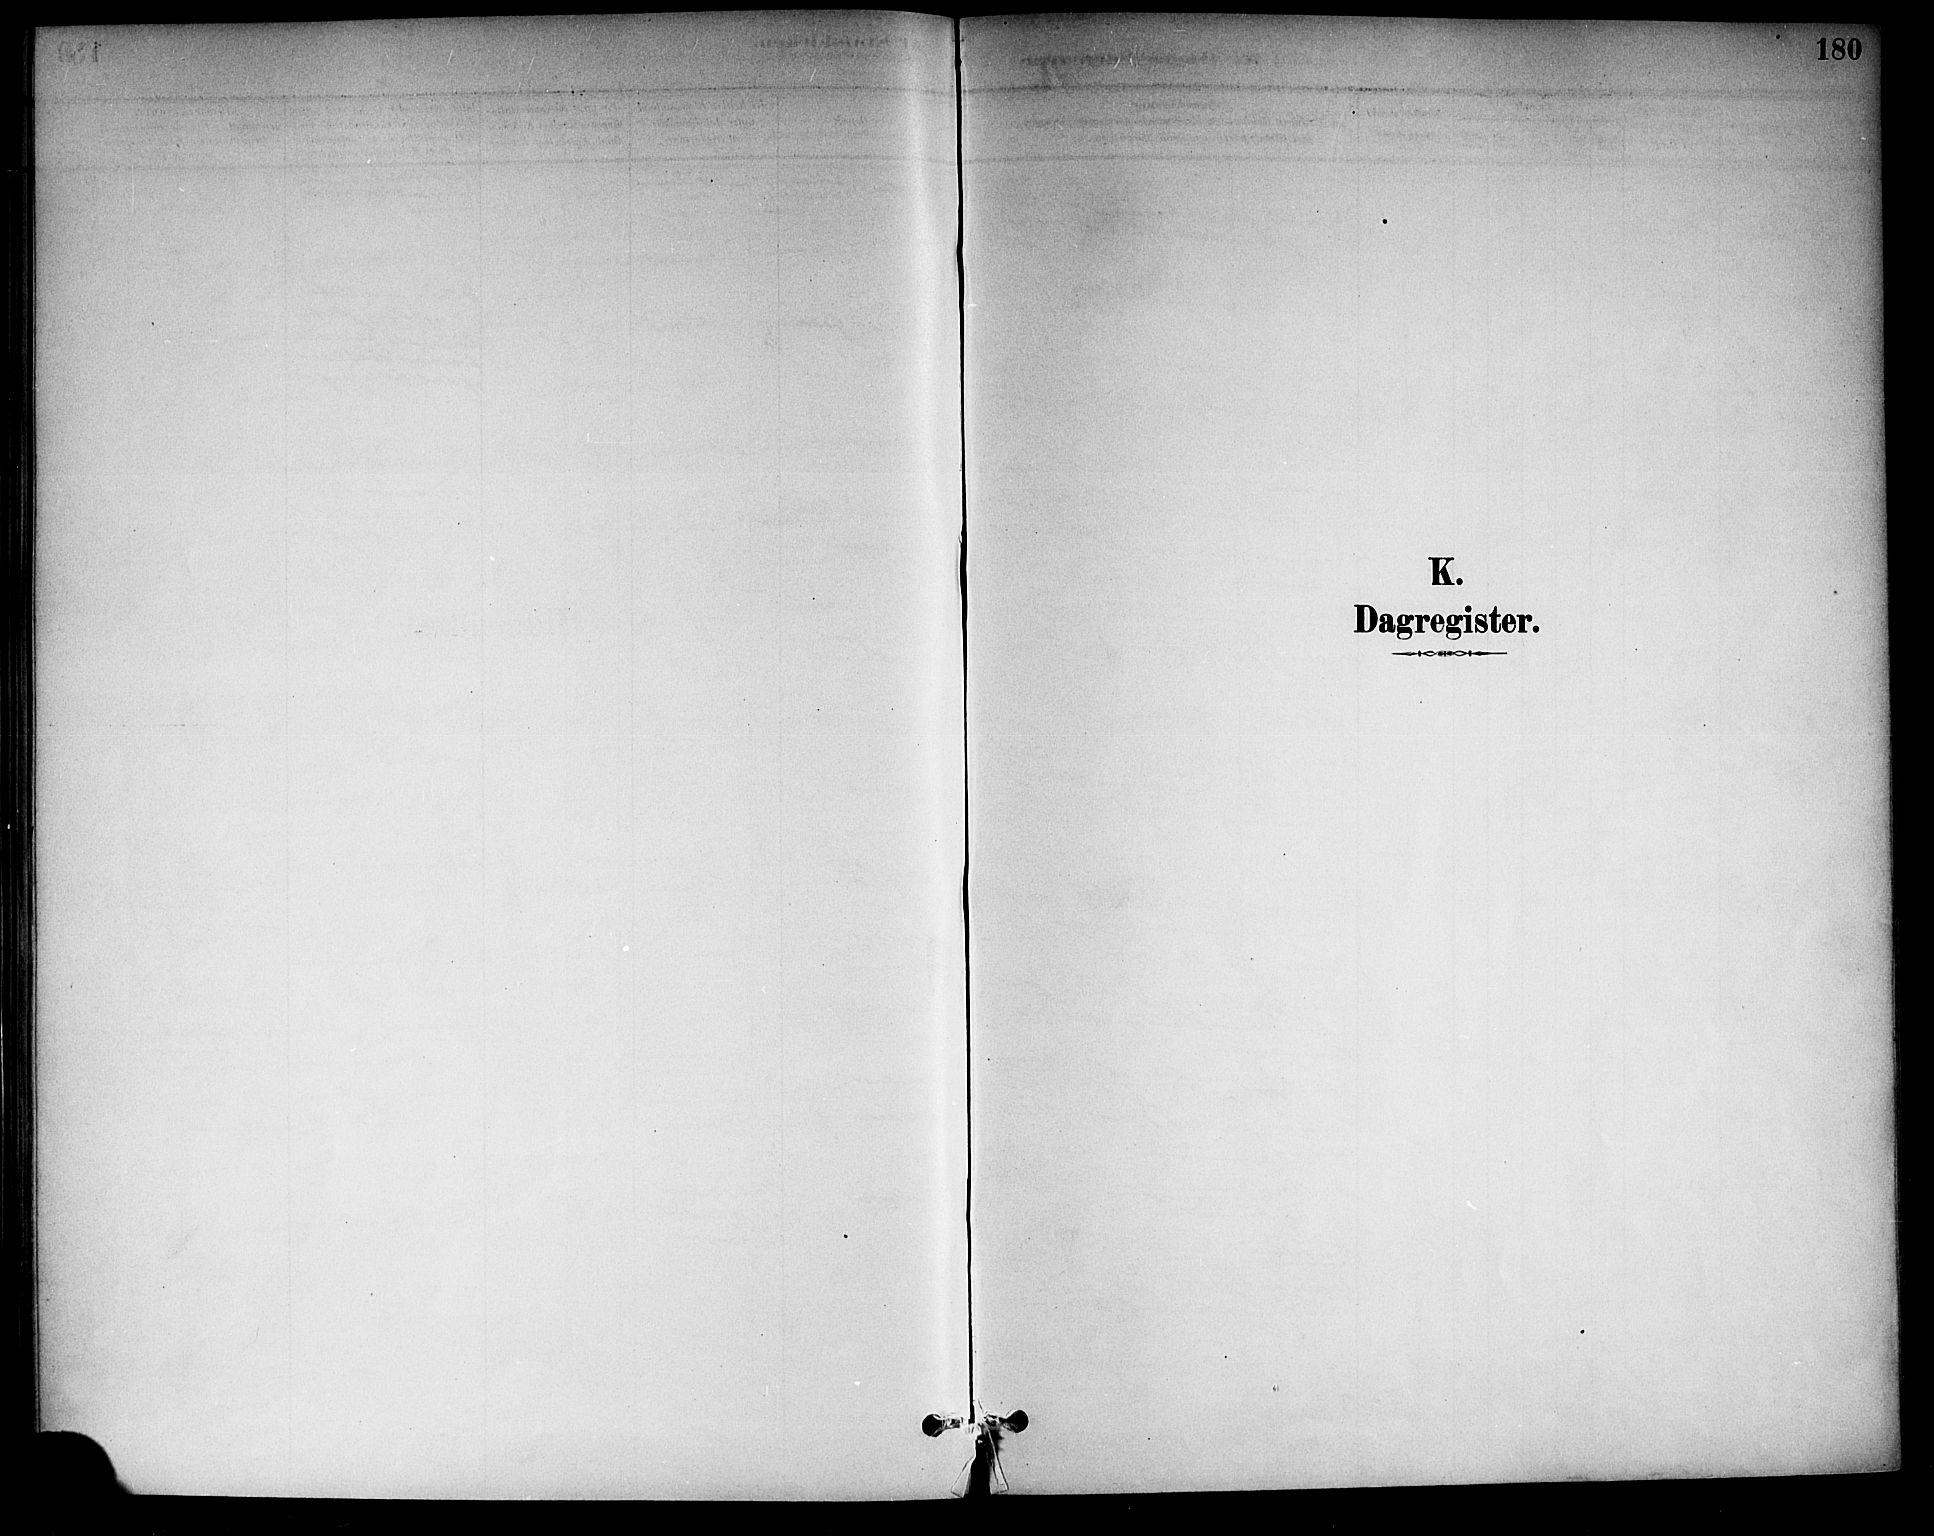 SAKO, Drangedal kirkebøker, F/Fa/L0011: Ministerialbok nr. 11 /1, 1885-1894, s. 180